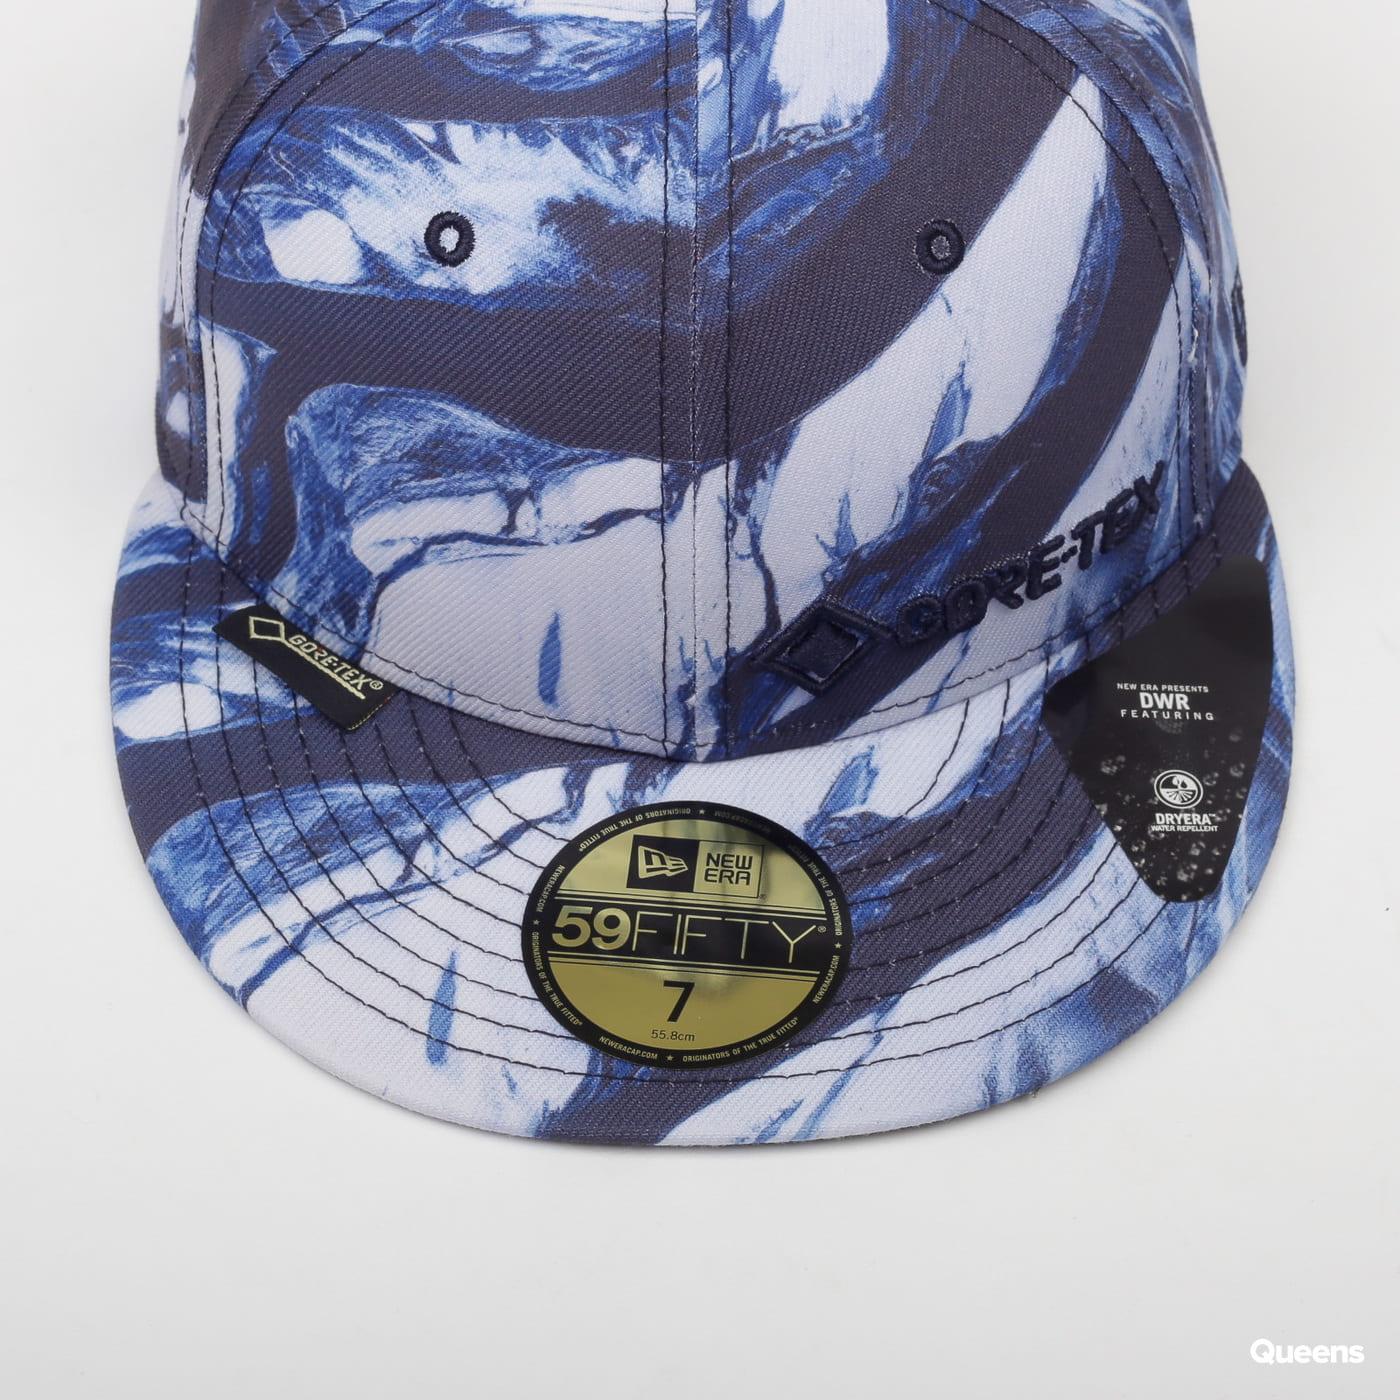 New Era 5950 Winterscape Goretex biela / modrá / navy